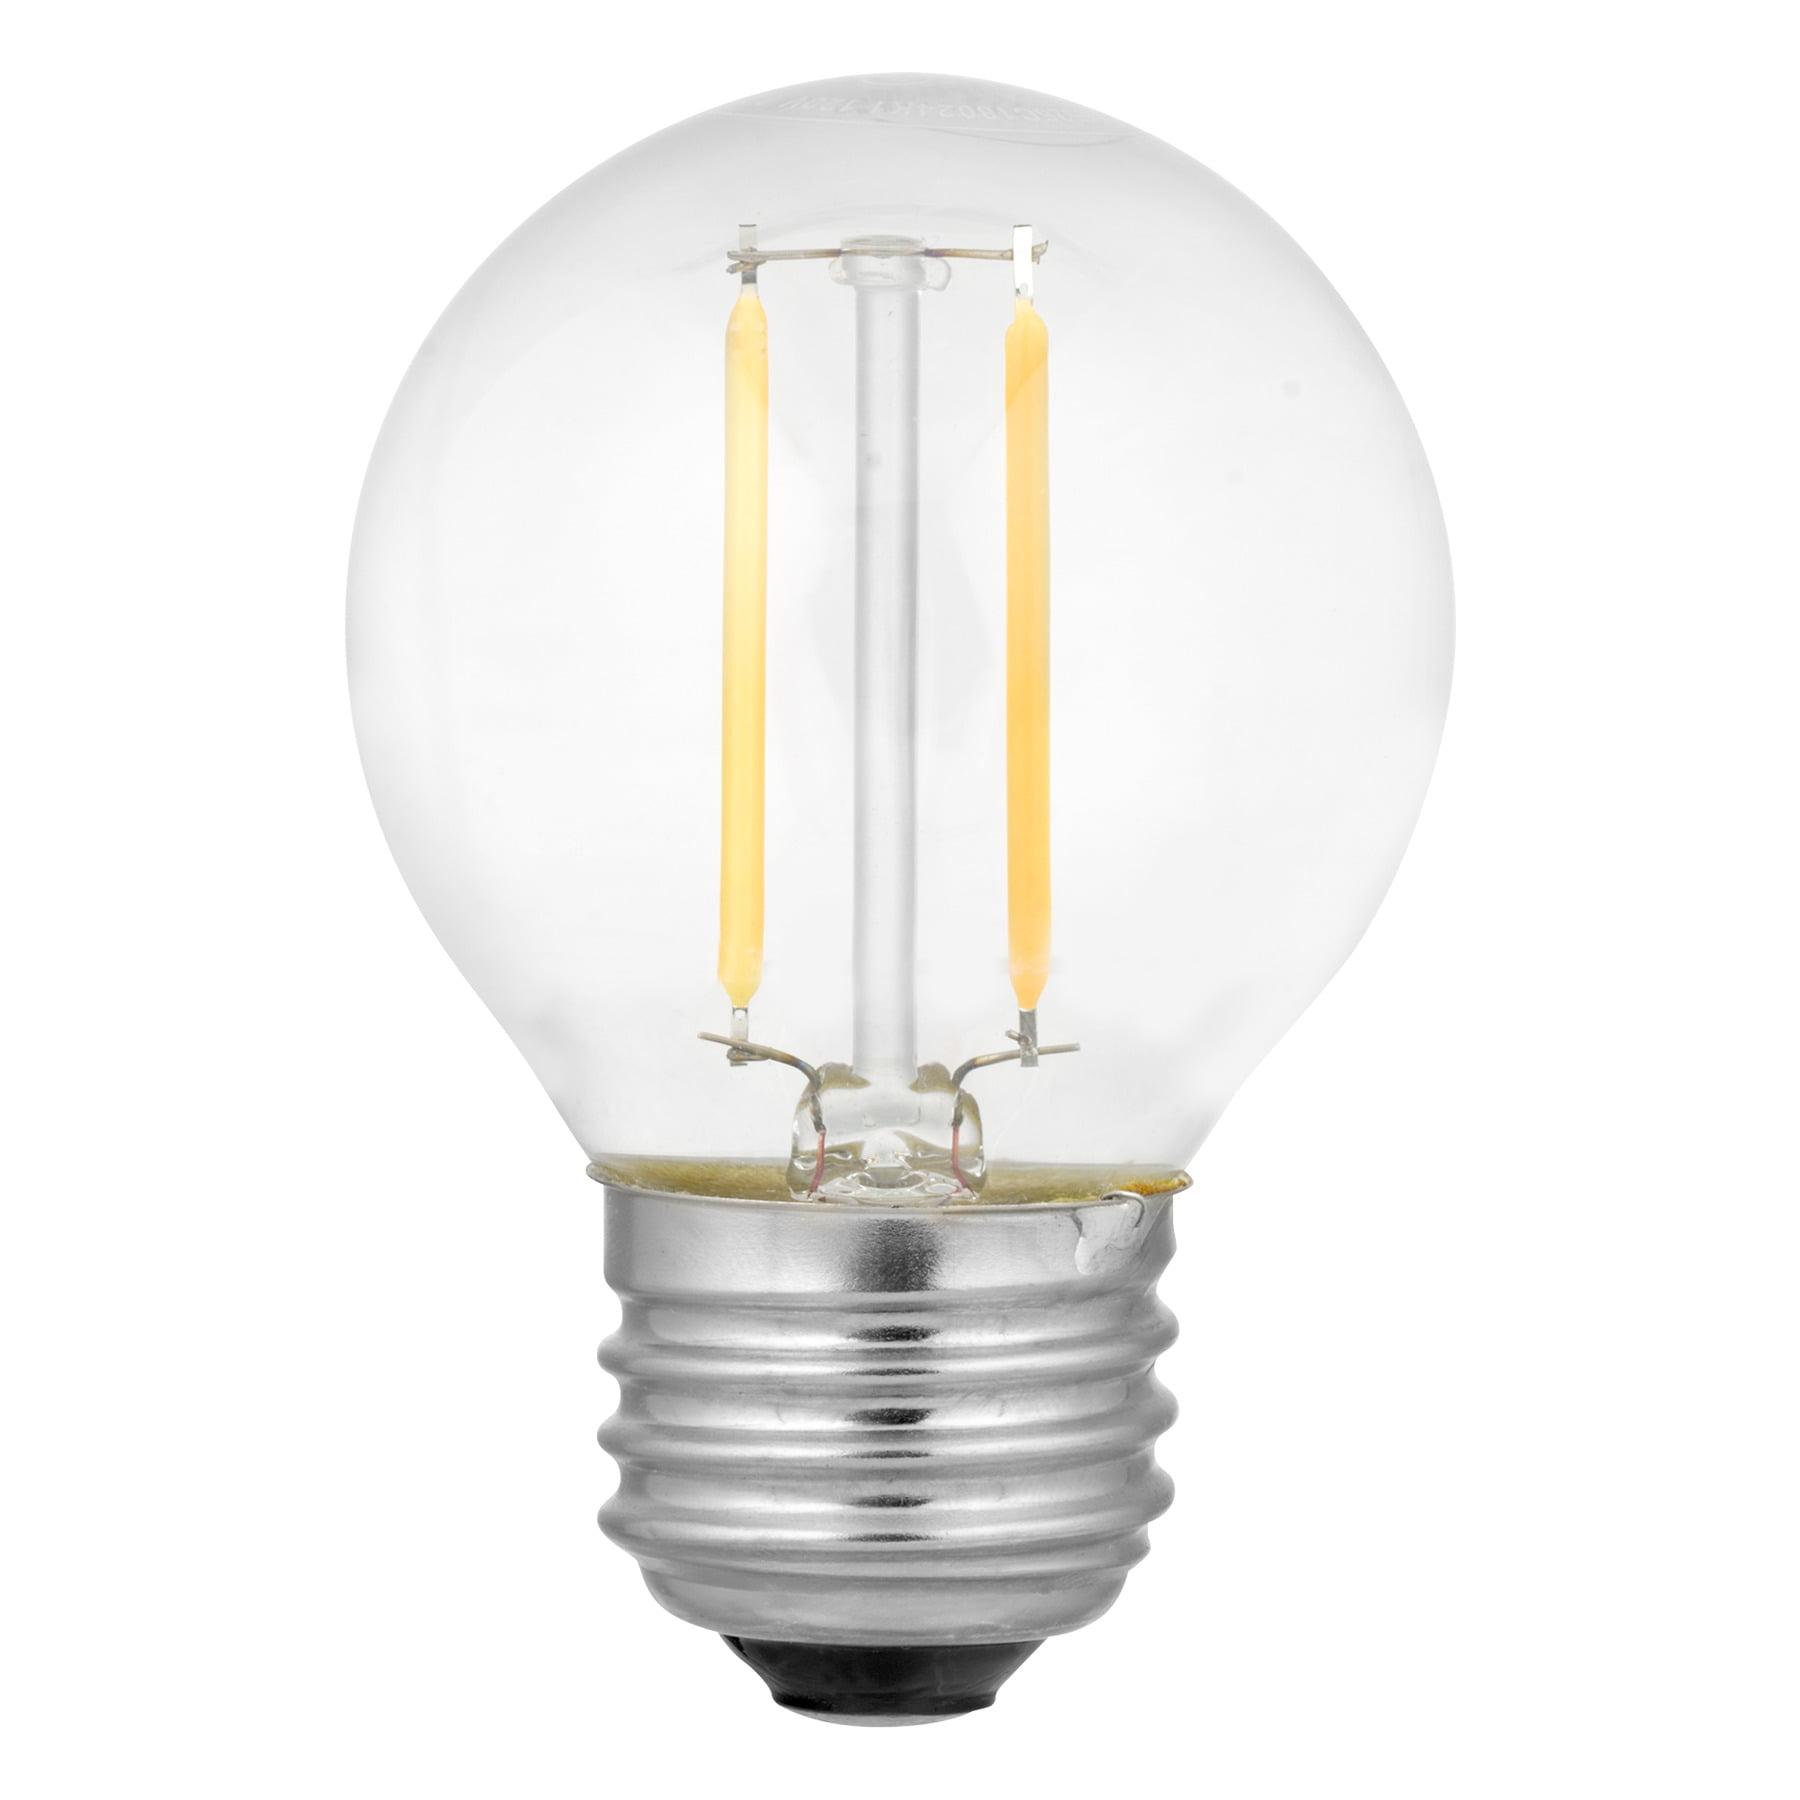 Nu-Tech LED Filament Globe Light Bulb, 2W (25W Equivalent), Clear, 1-count